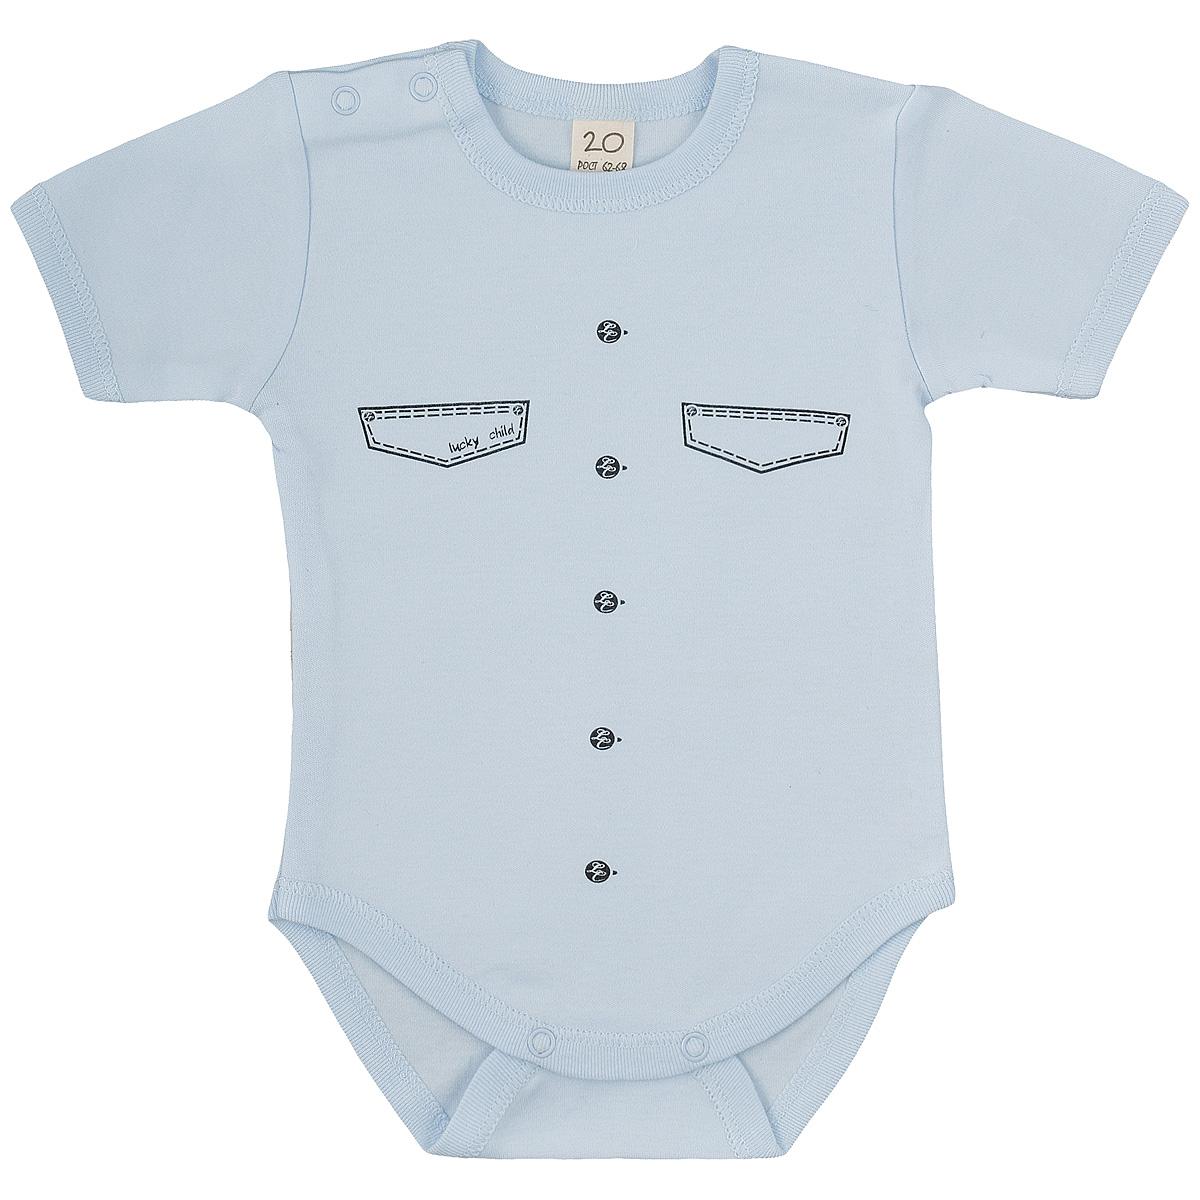 Боди-футболка для мальчика Lucky Child, цвет: голубой. 3-30. Размер 80/86